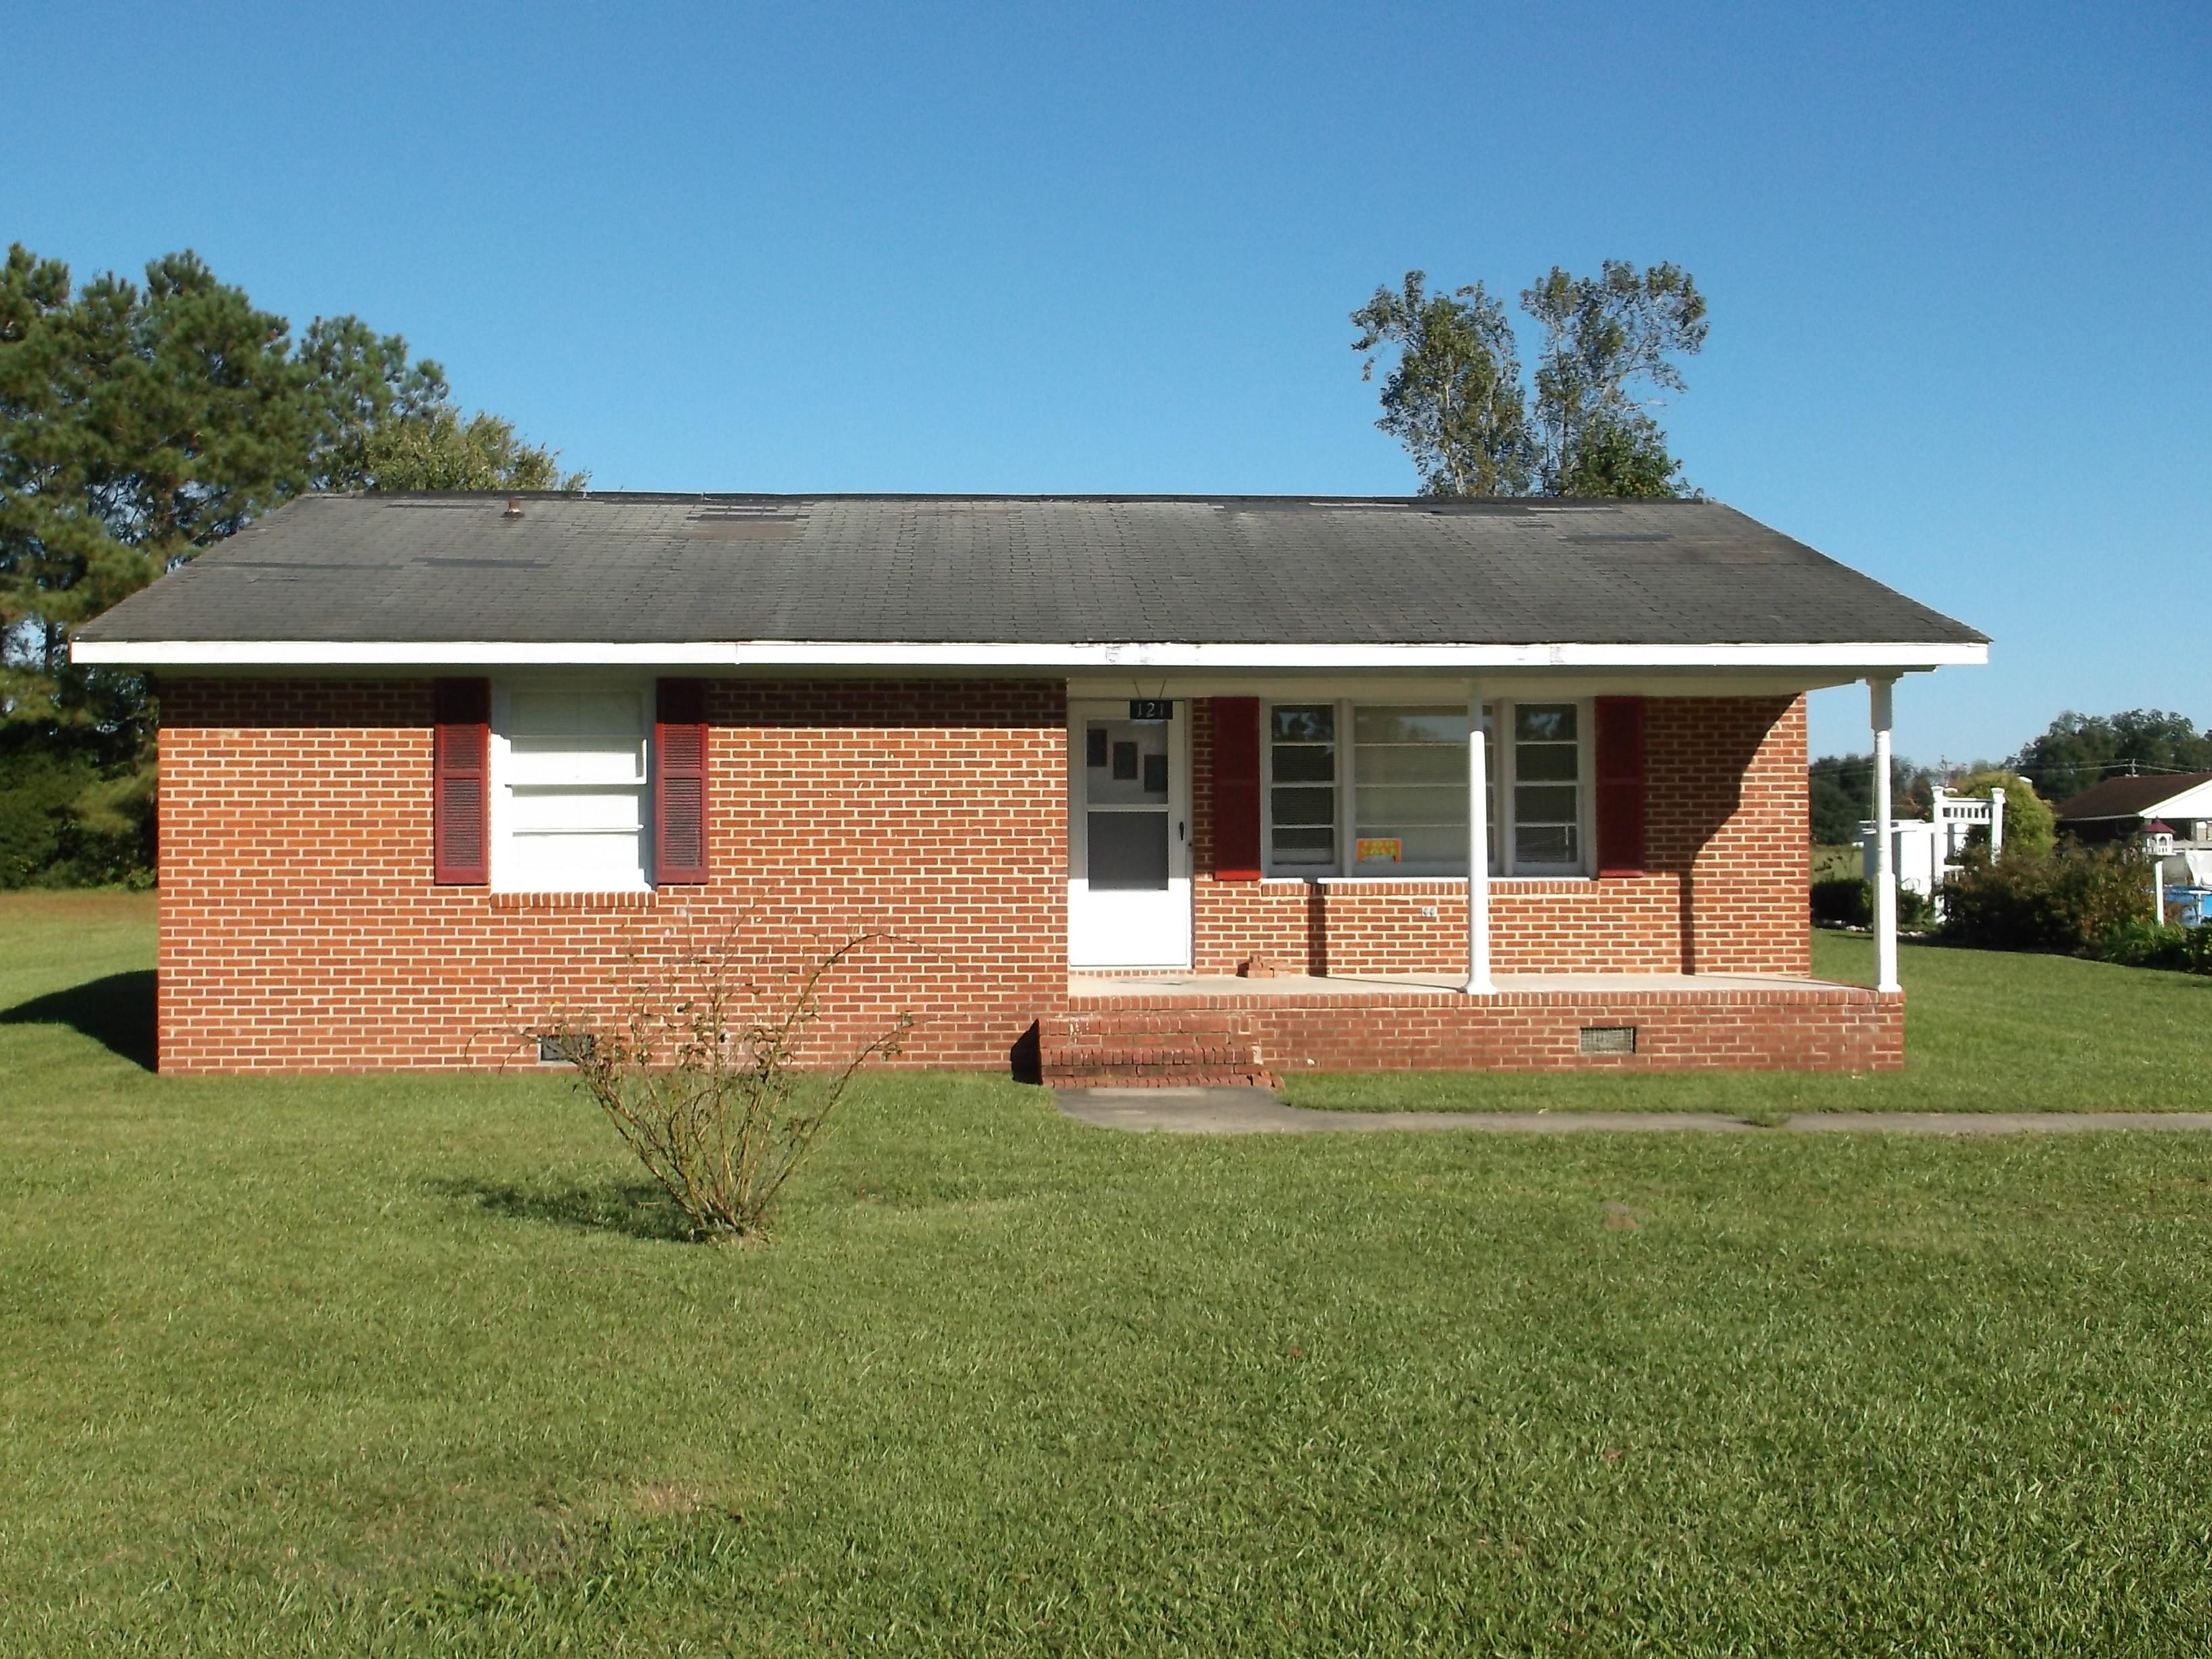 121 Kinlaw Dr., Chadbourn, North Carolina 28431